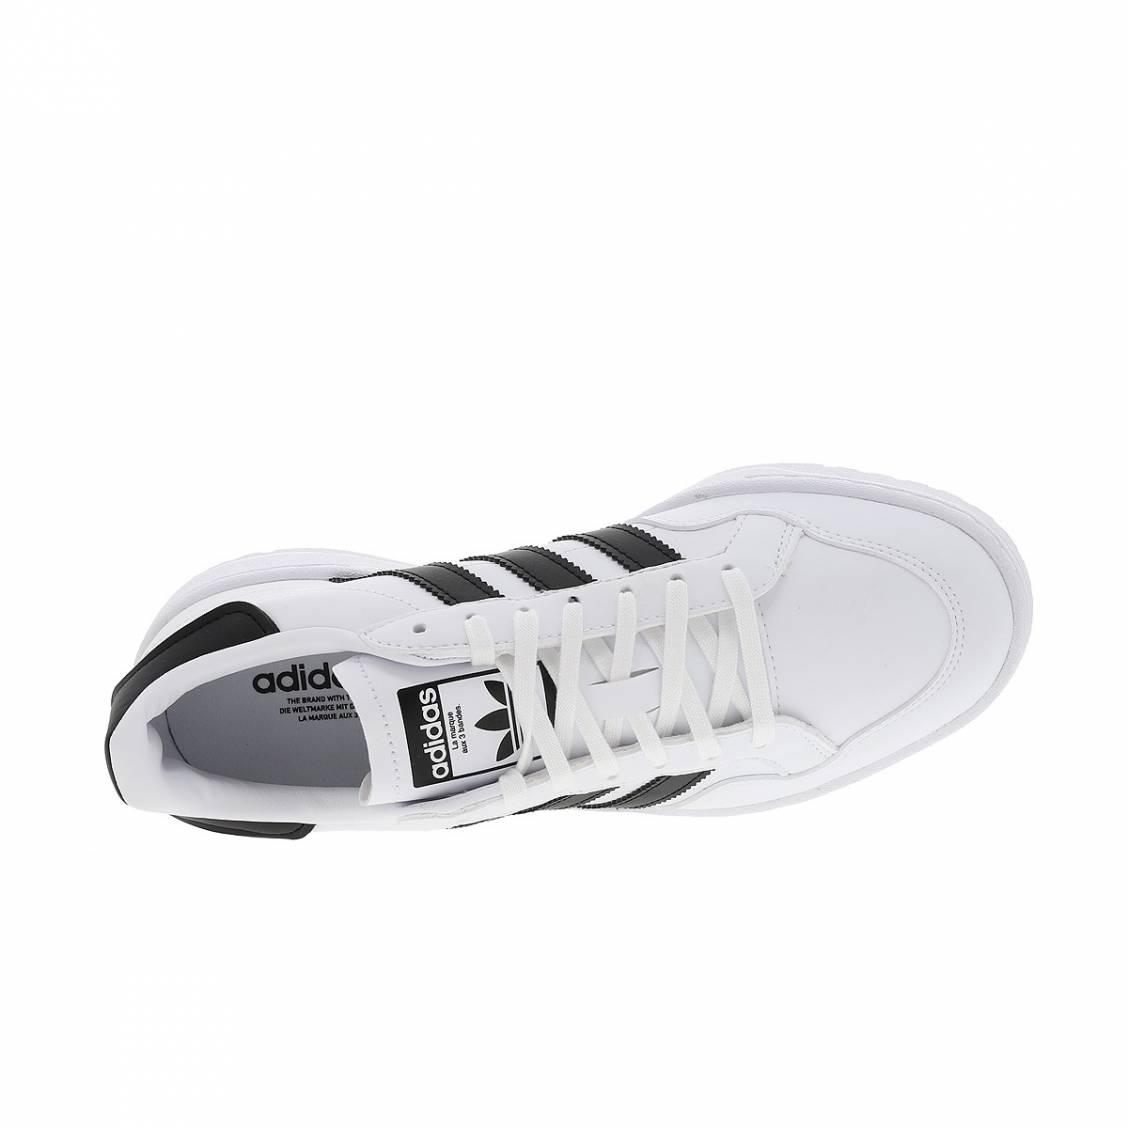 Baskets Adidas Team Court en cuir blanc et noir | Rue Des Hommes